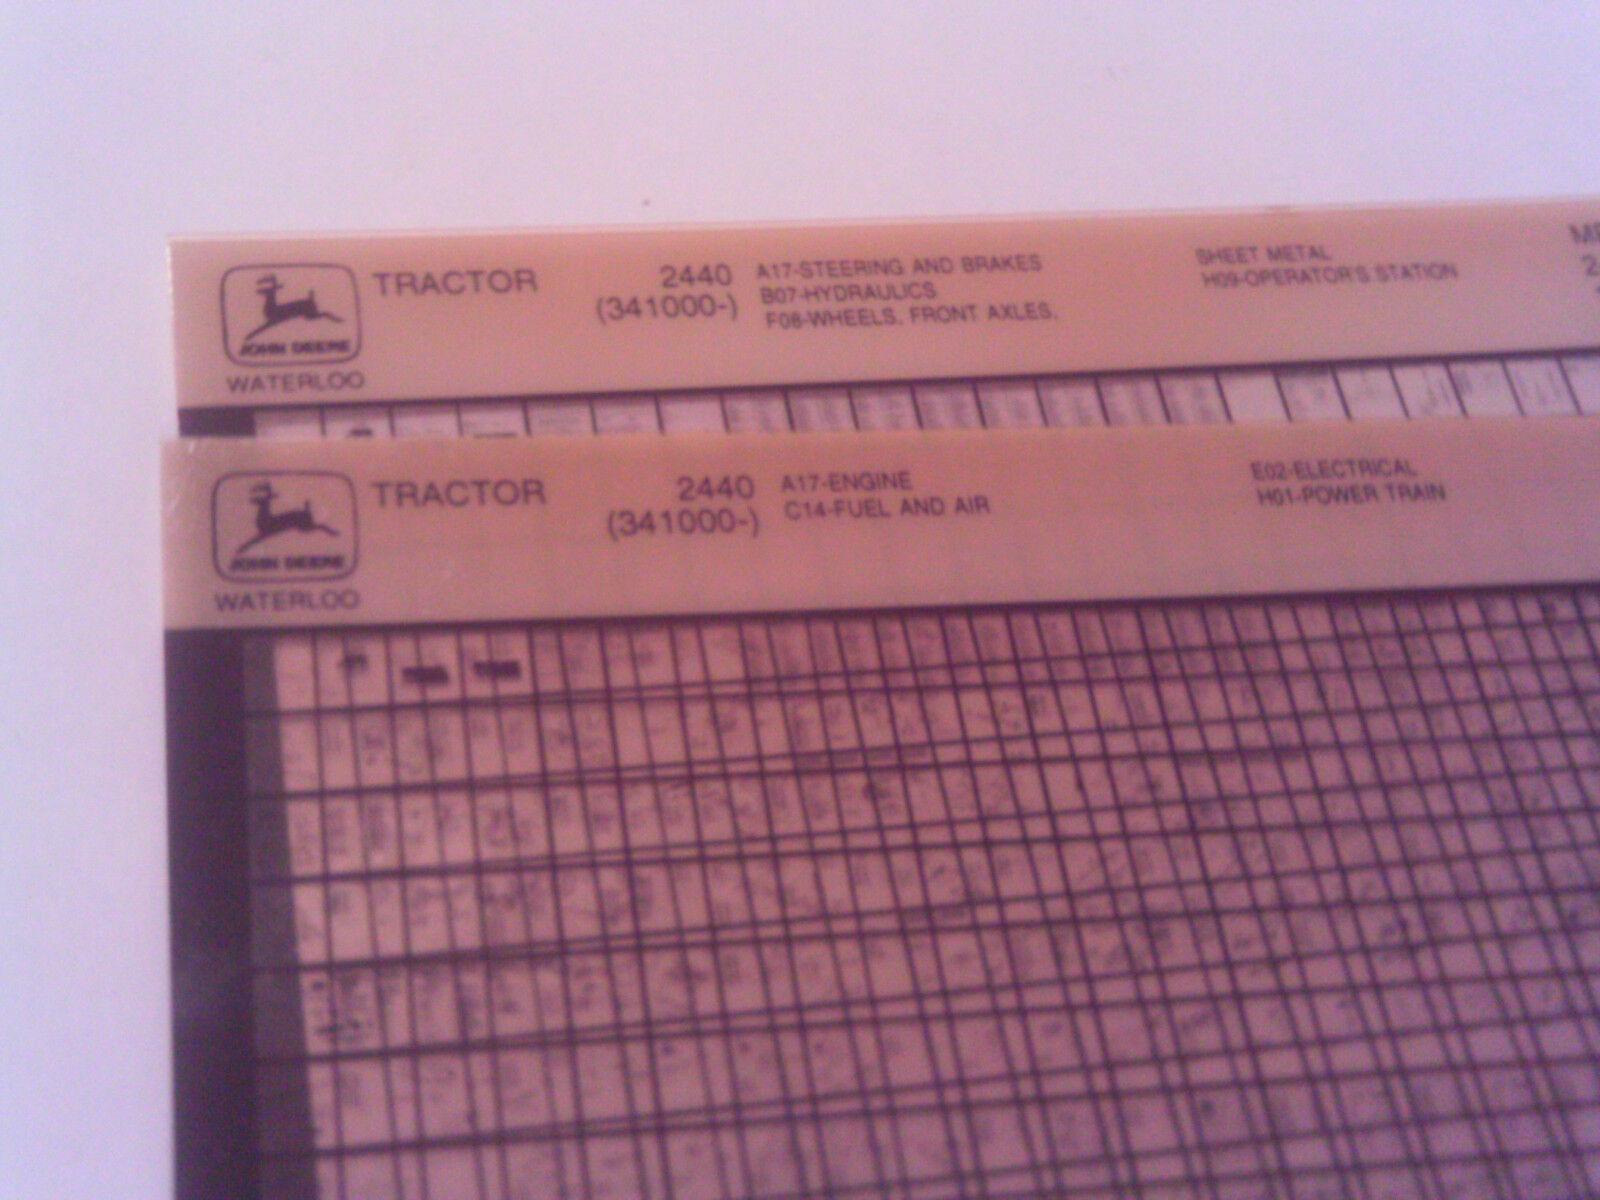 s l1600 john deere 2440 tractor parts manual (sn 341 000 & up) ebay